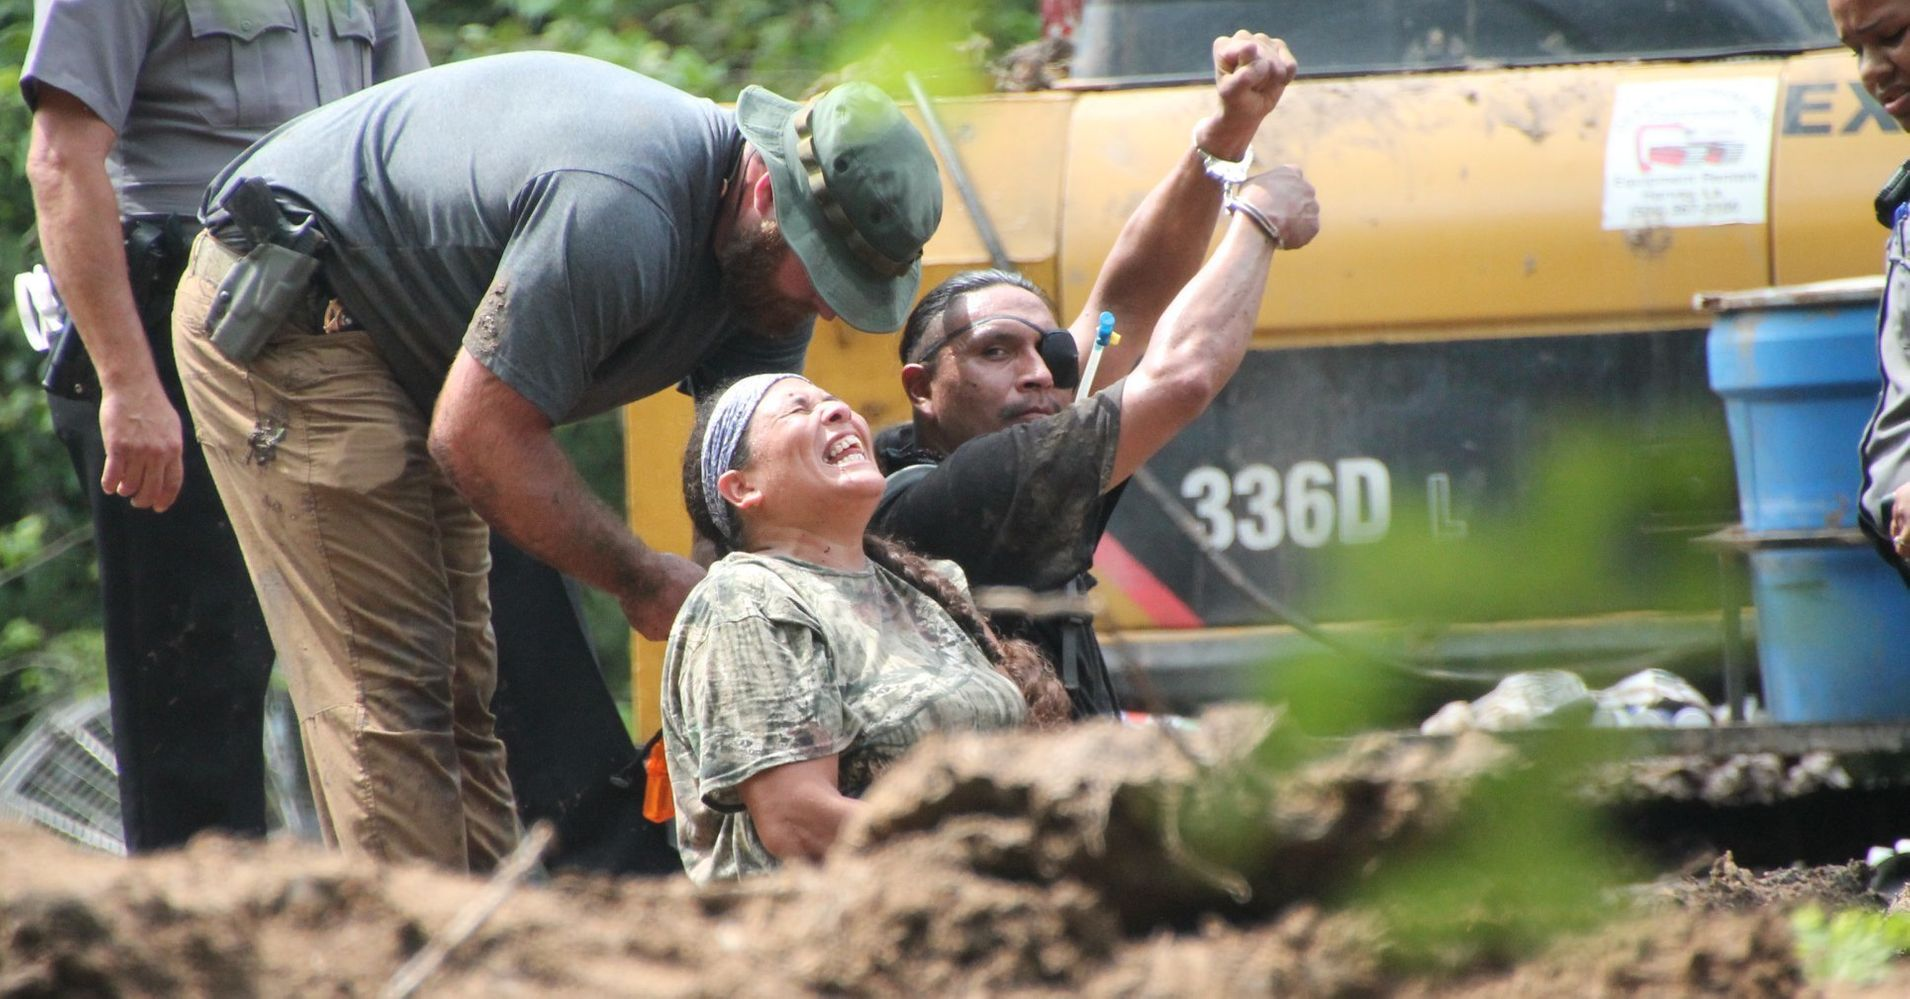 Bayou Bridge Environmental Activists: 'Anti-Protes...